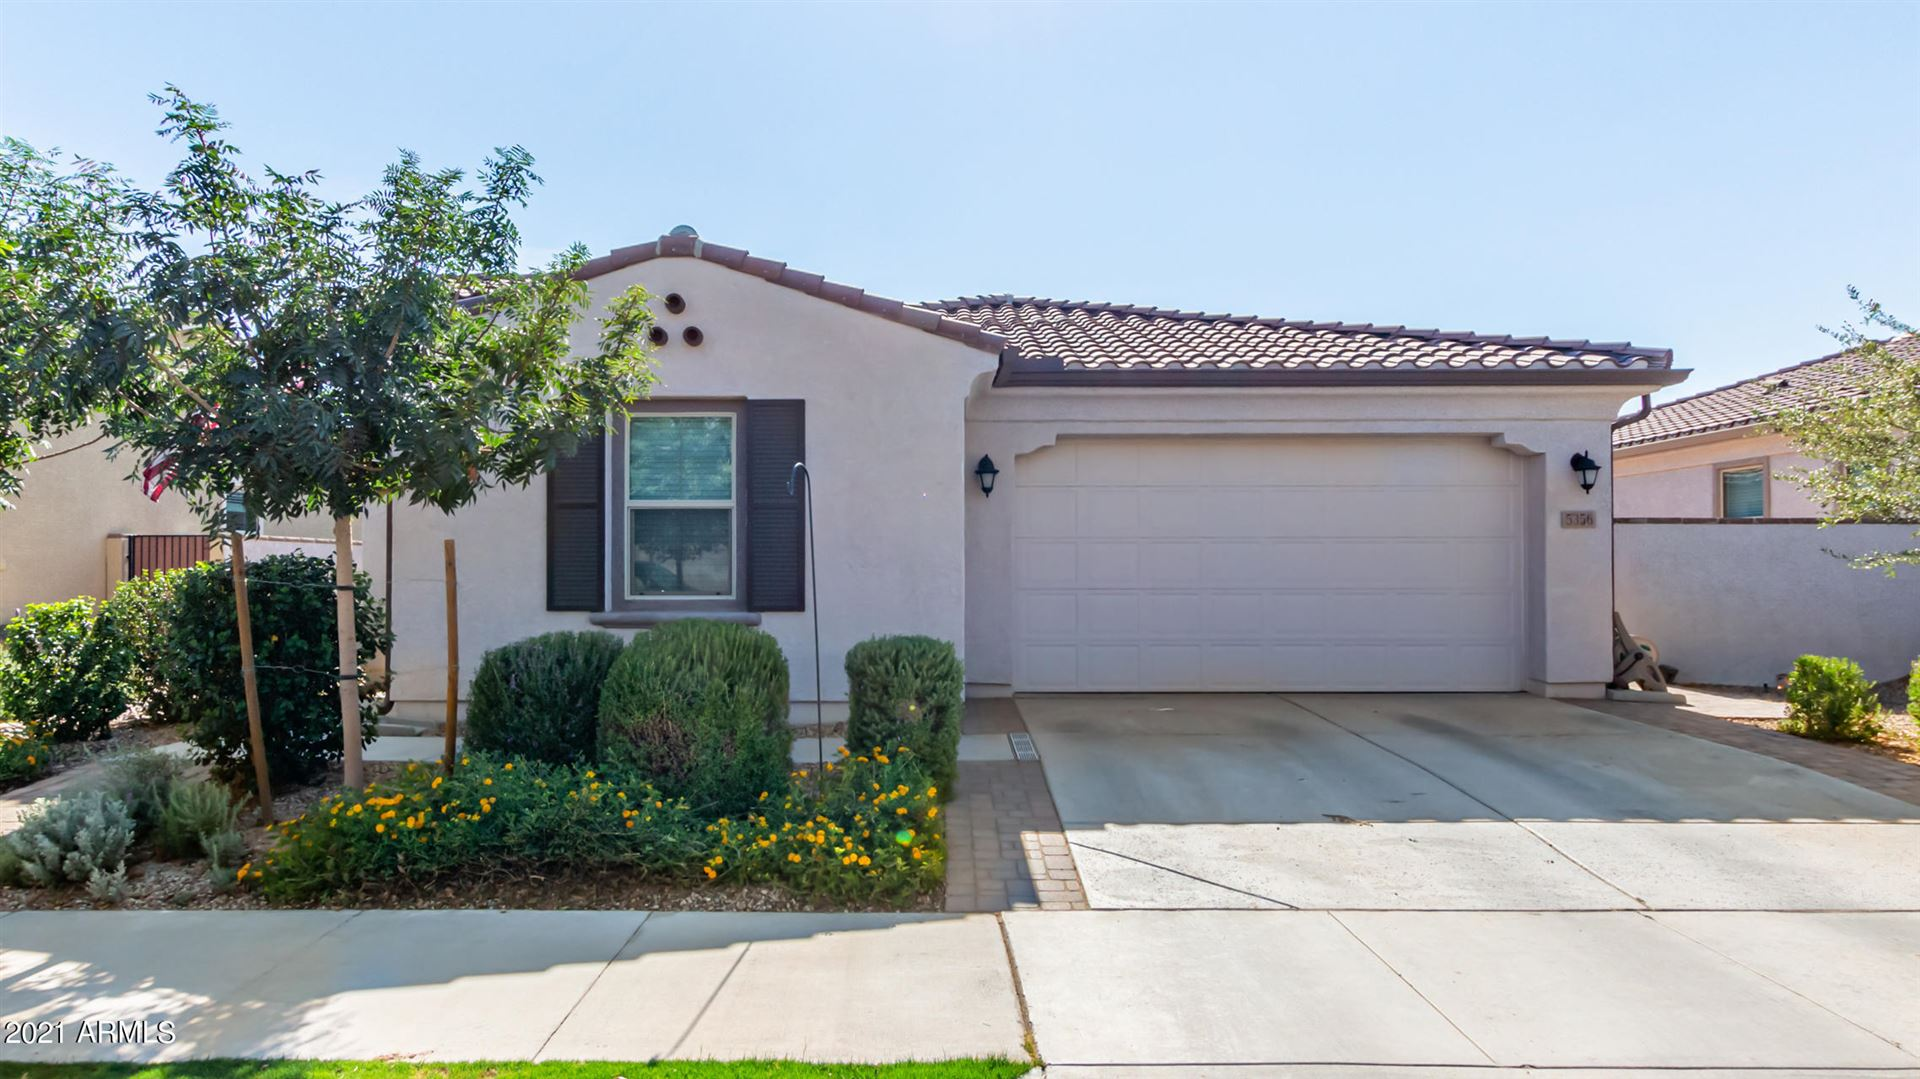 Photo of 5356 S 98TH Place, Mesa, AZ 85212 (MLS # 6264716)